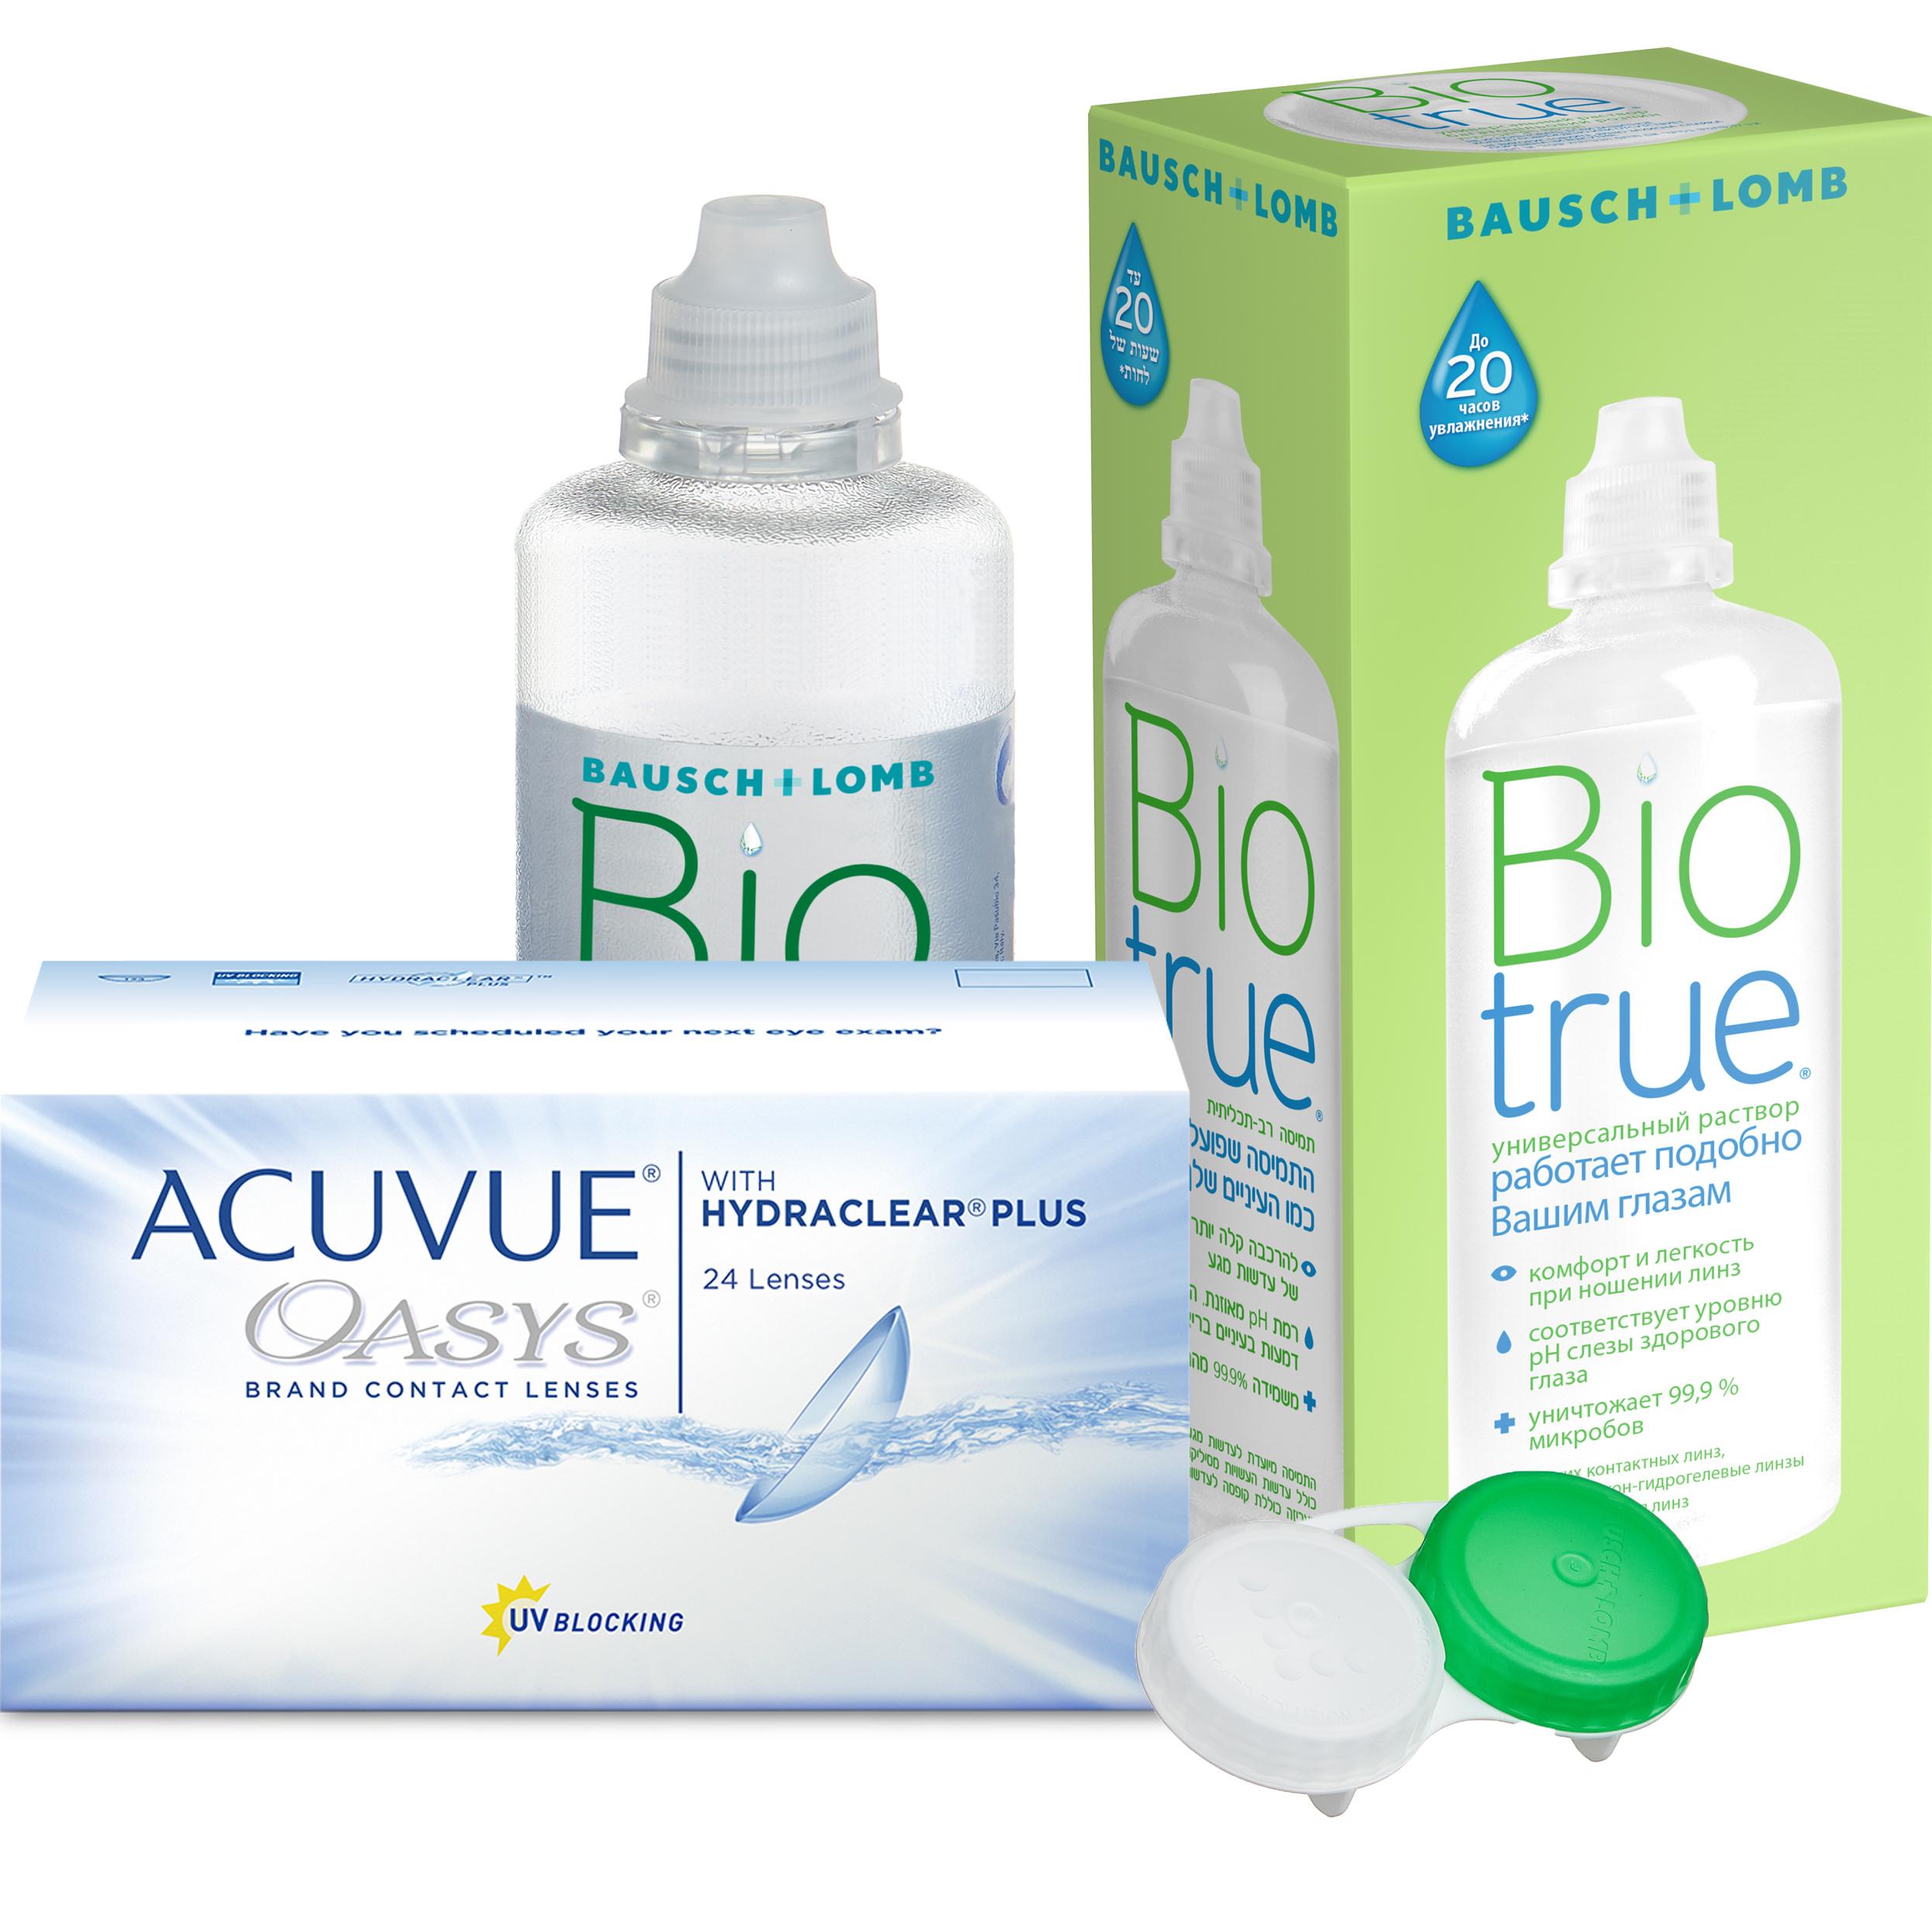 Купить Oasys with Hydraclear Plus 24 линзы + Biotrue, Контактные линзы Acuvue Oasys with Hydraclear Plus 24 линзы R 8.4 +6, 00 + Biotrue 300 мл